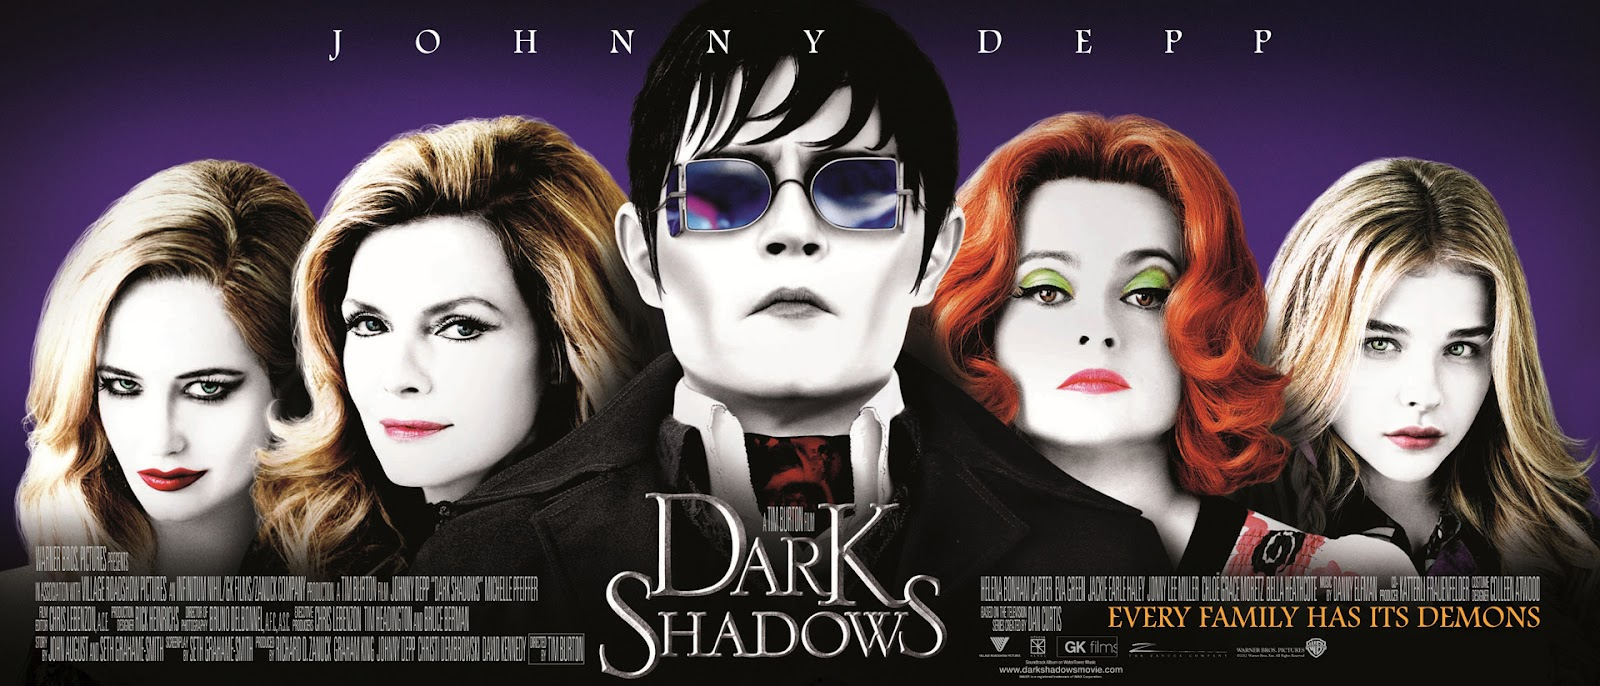 New Shadows Movie Banner Showcases Barnabas Women